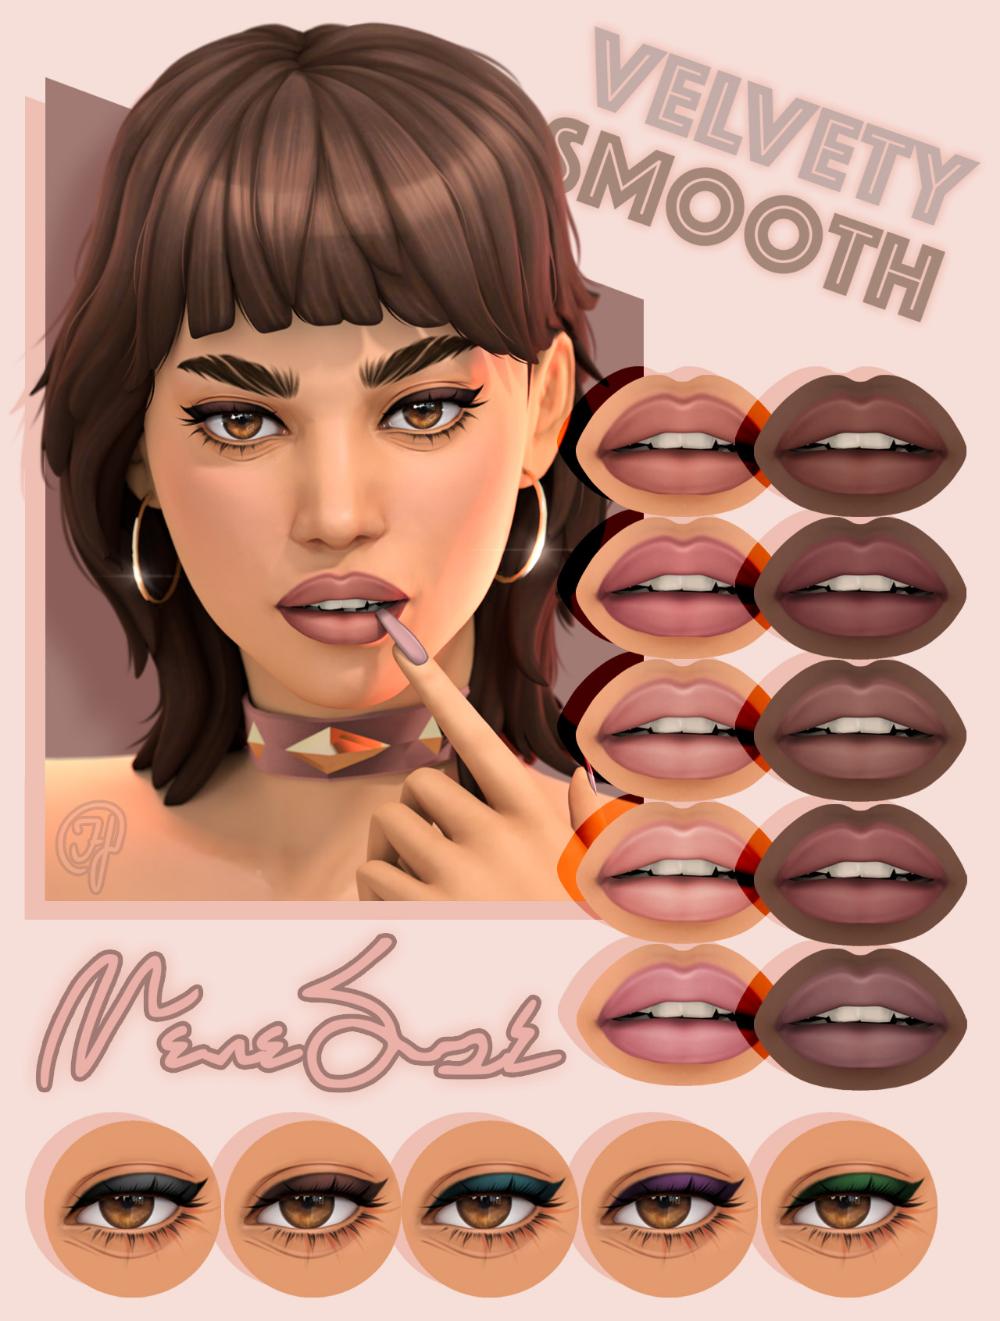 Emmibouquet - When I edit My Sims I always redraw